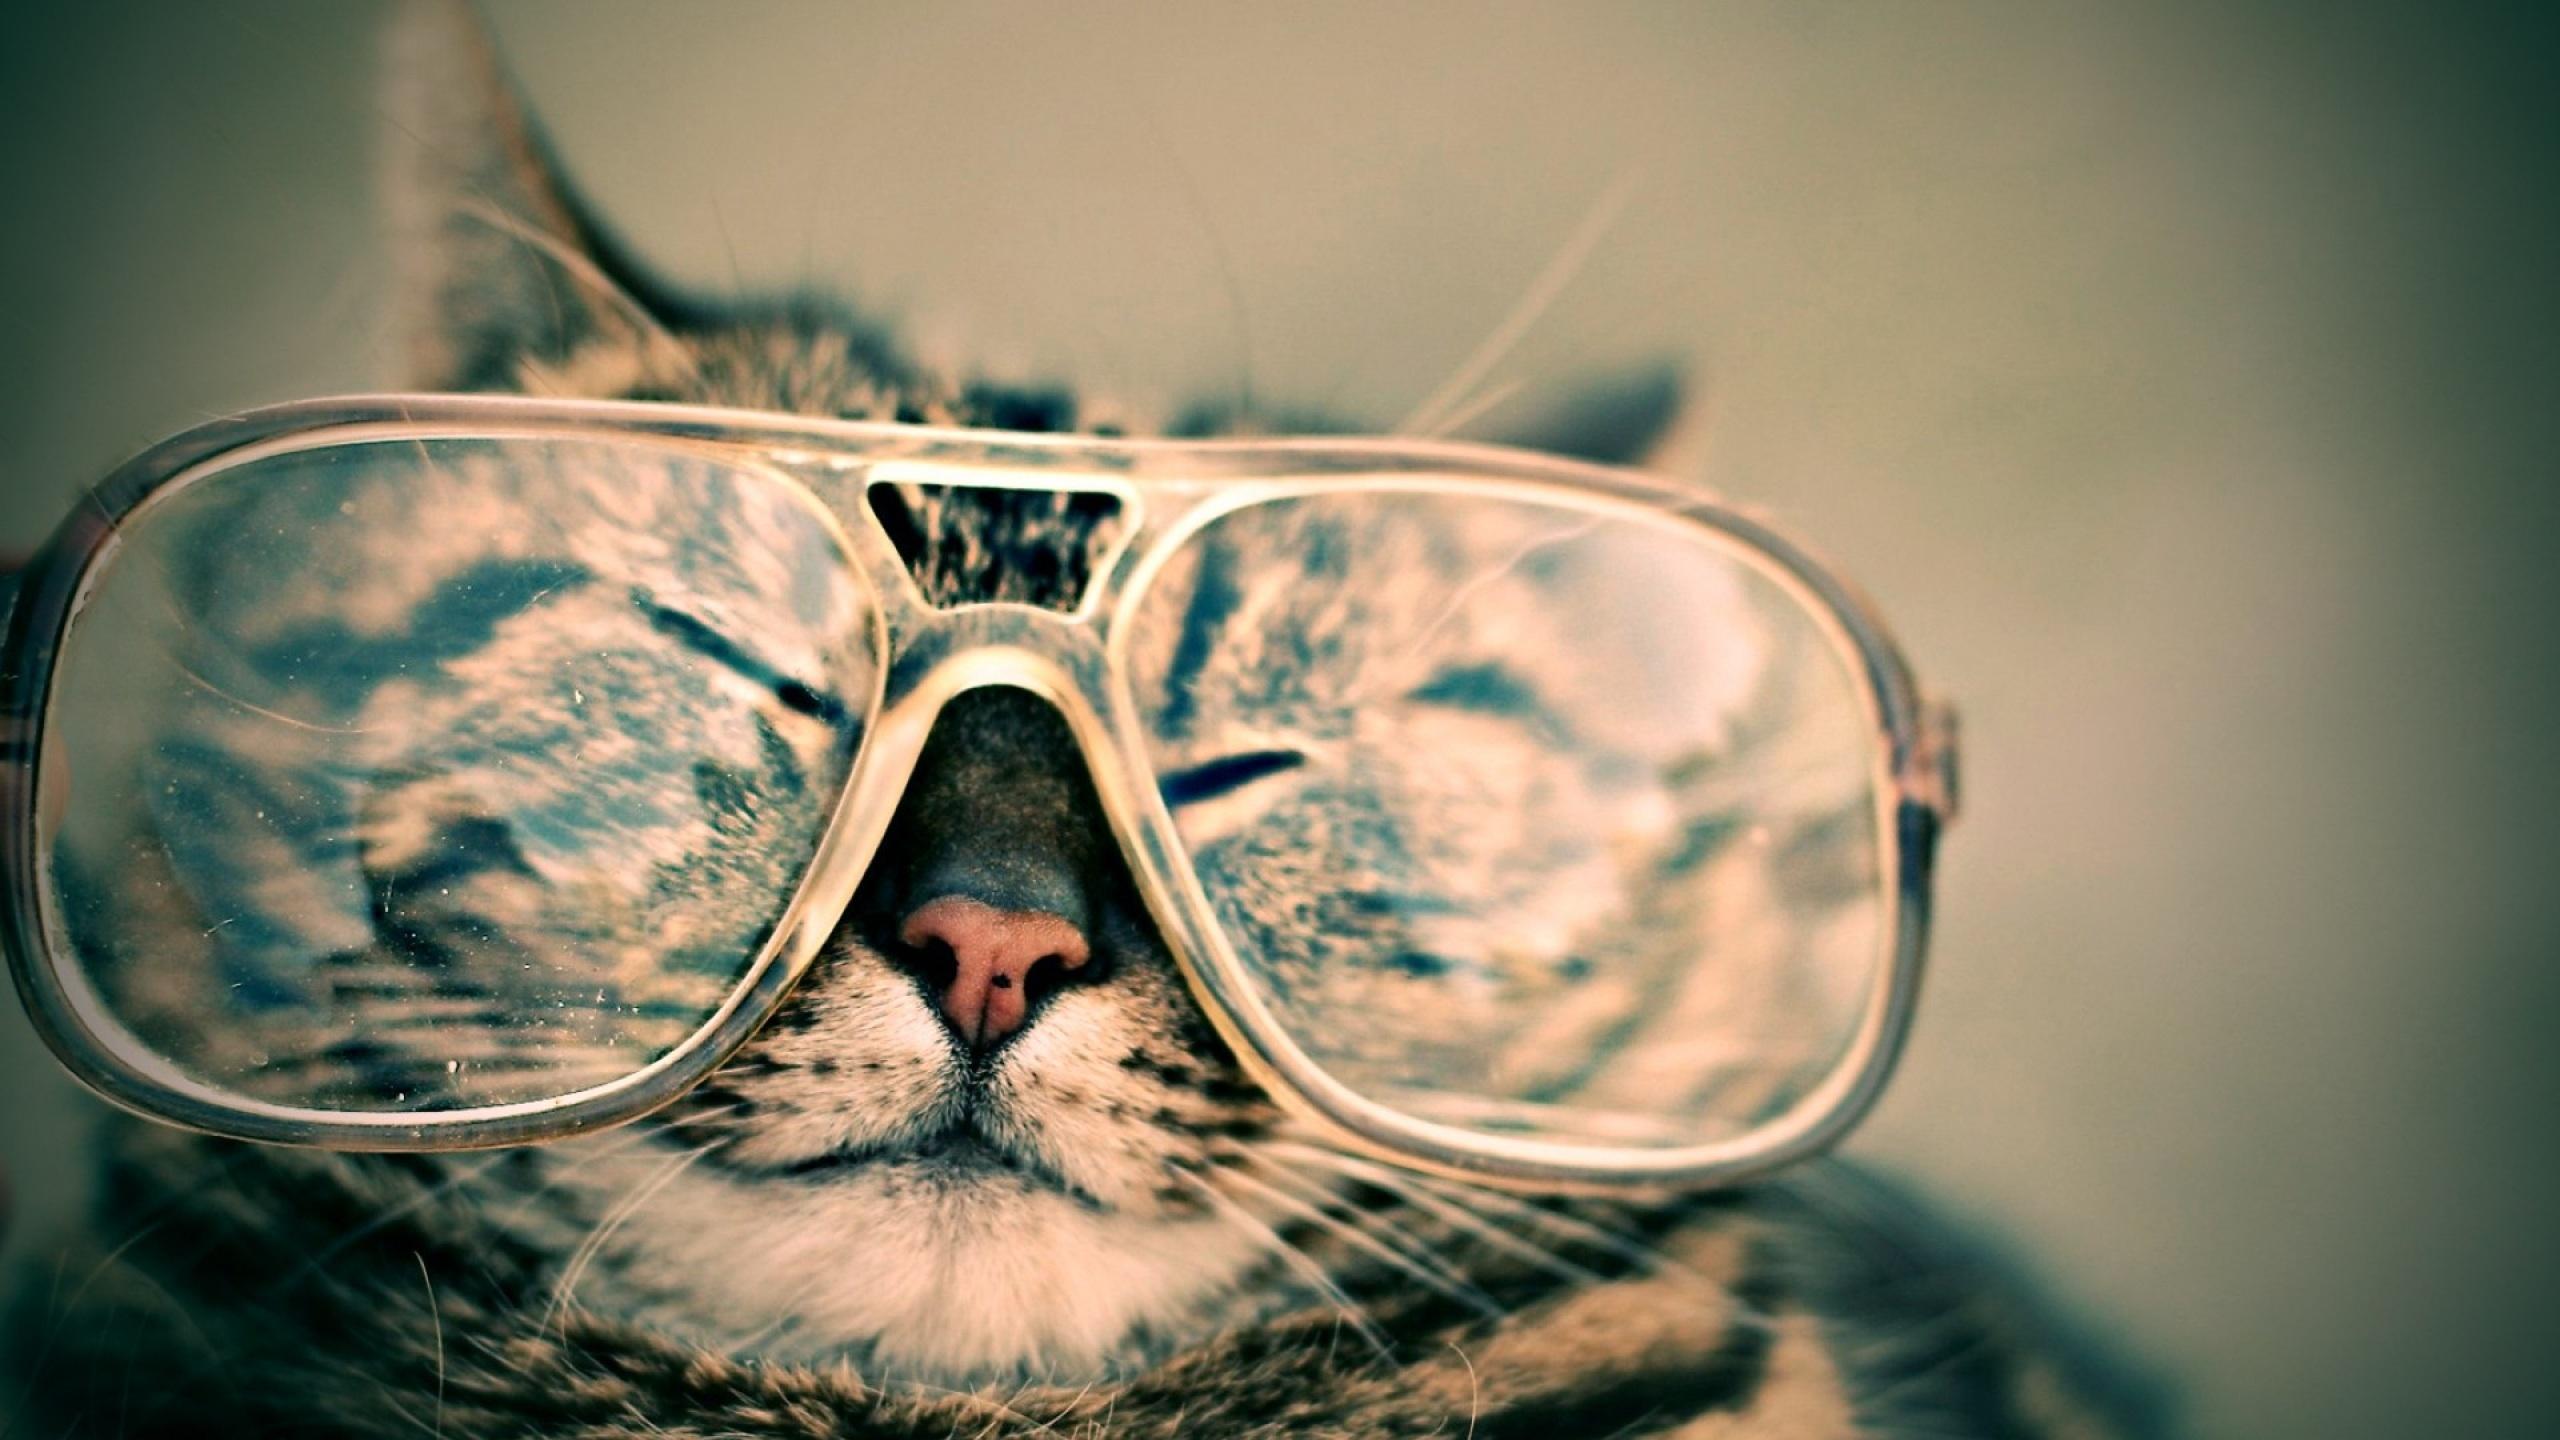 A photo of a cat wearing glasses by Octavio Fossatti on Unsplash